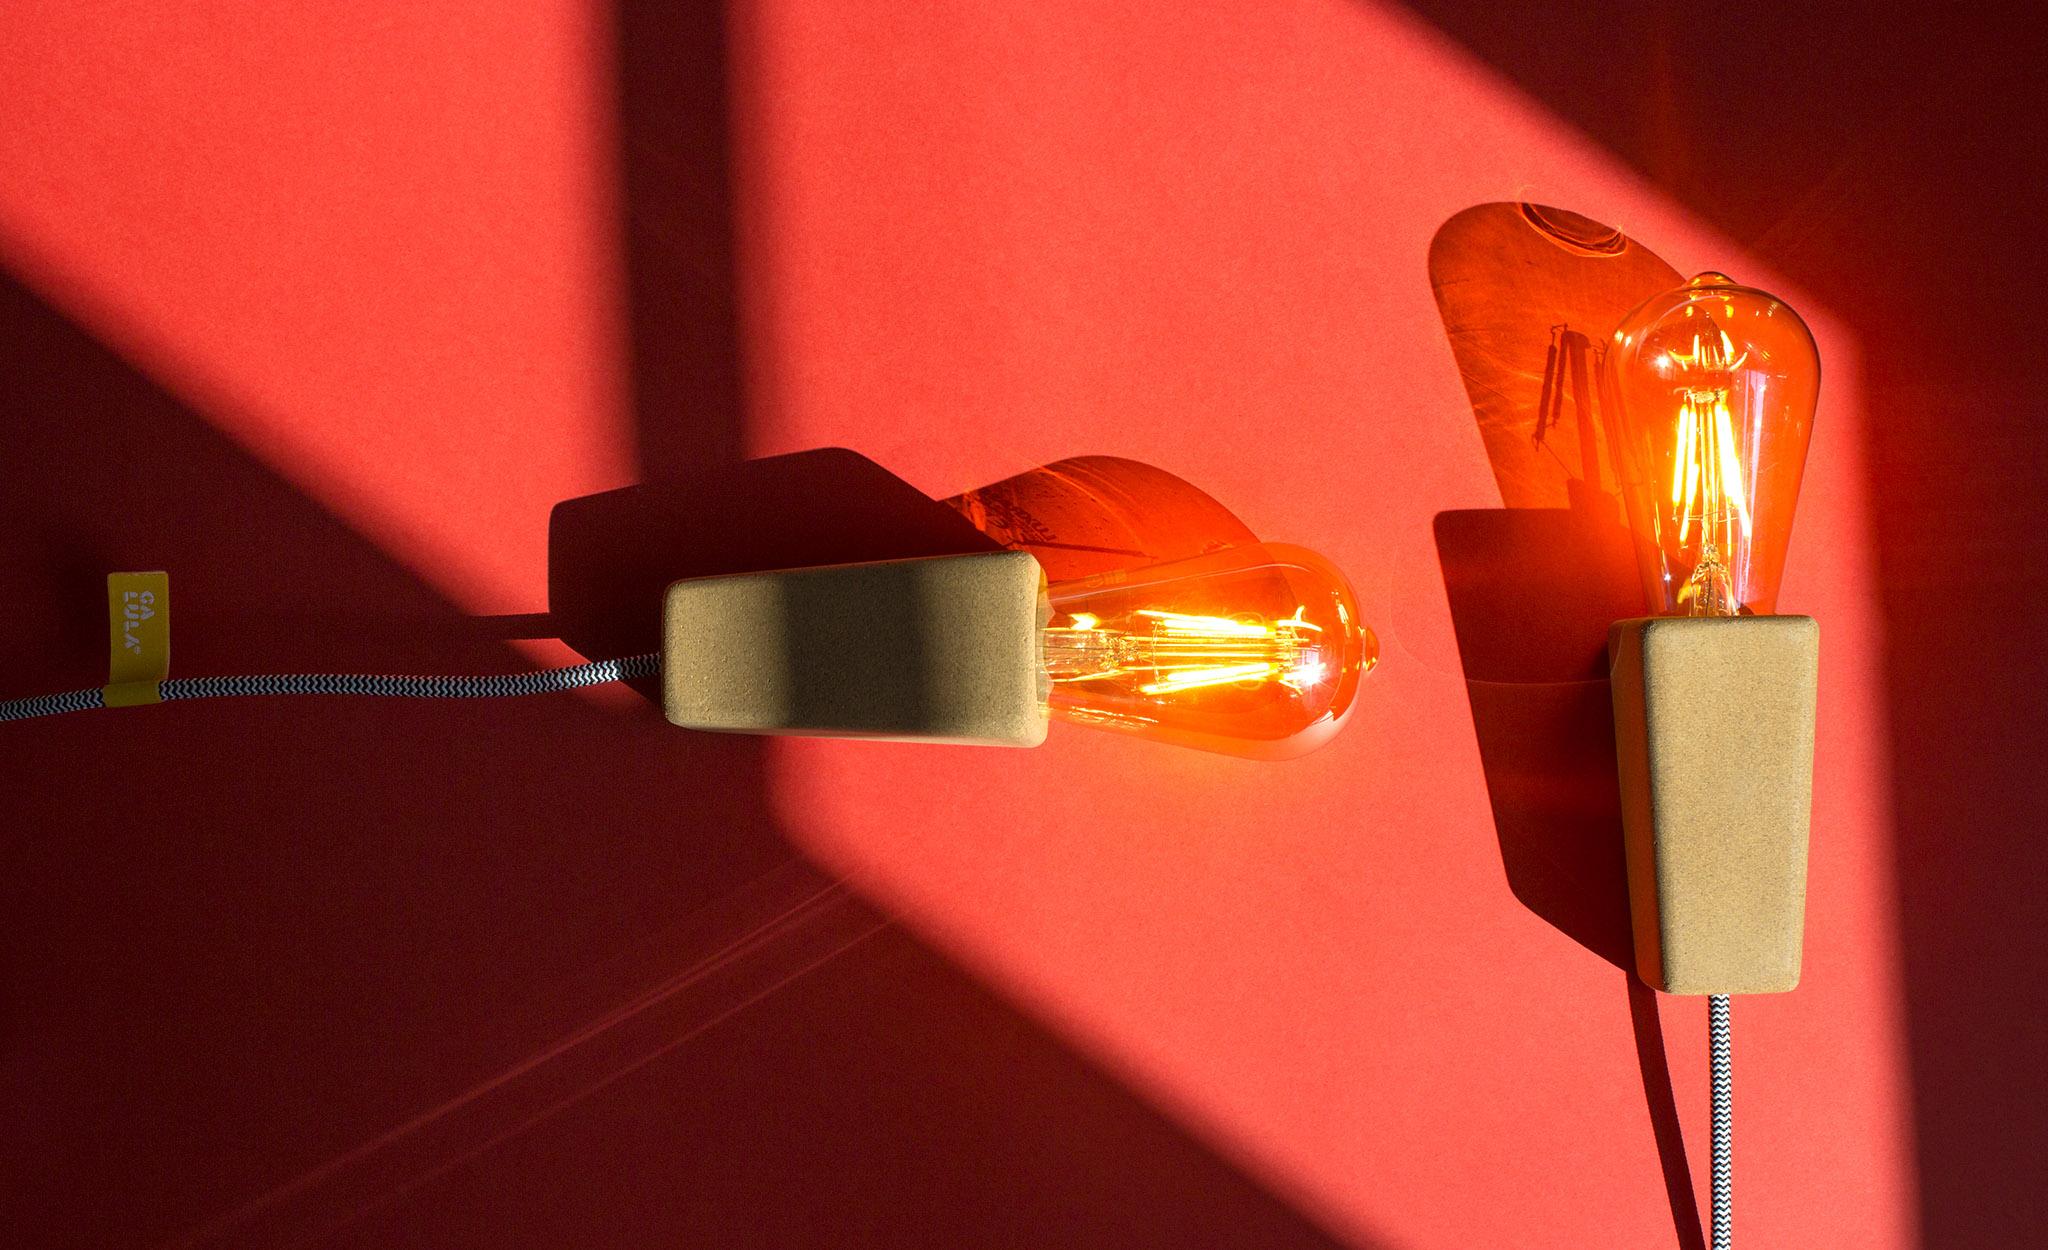 Galula Magneto cork lamp